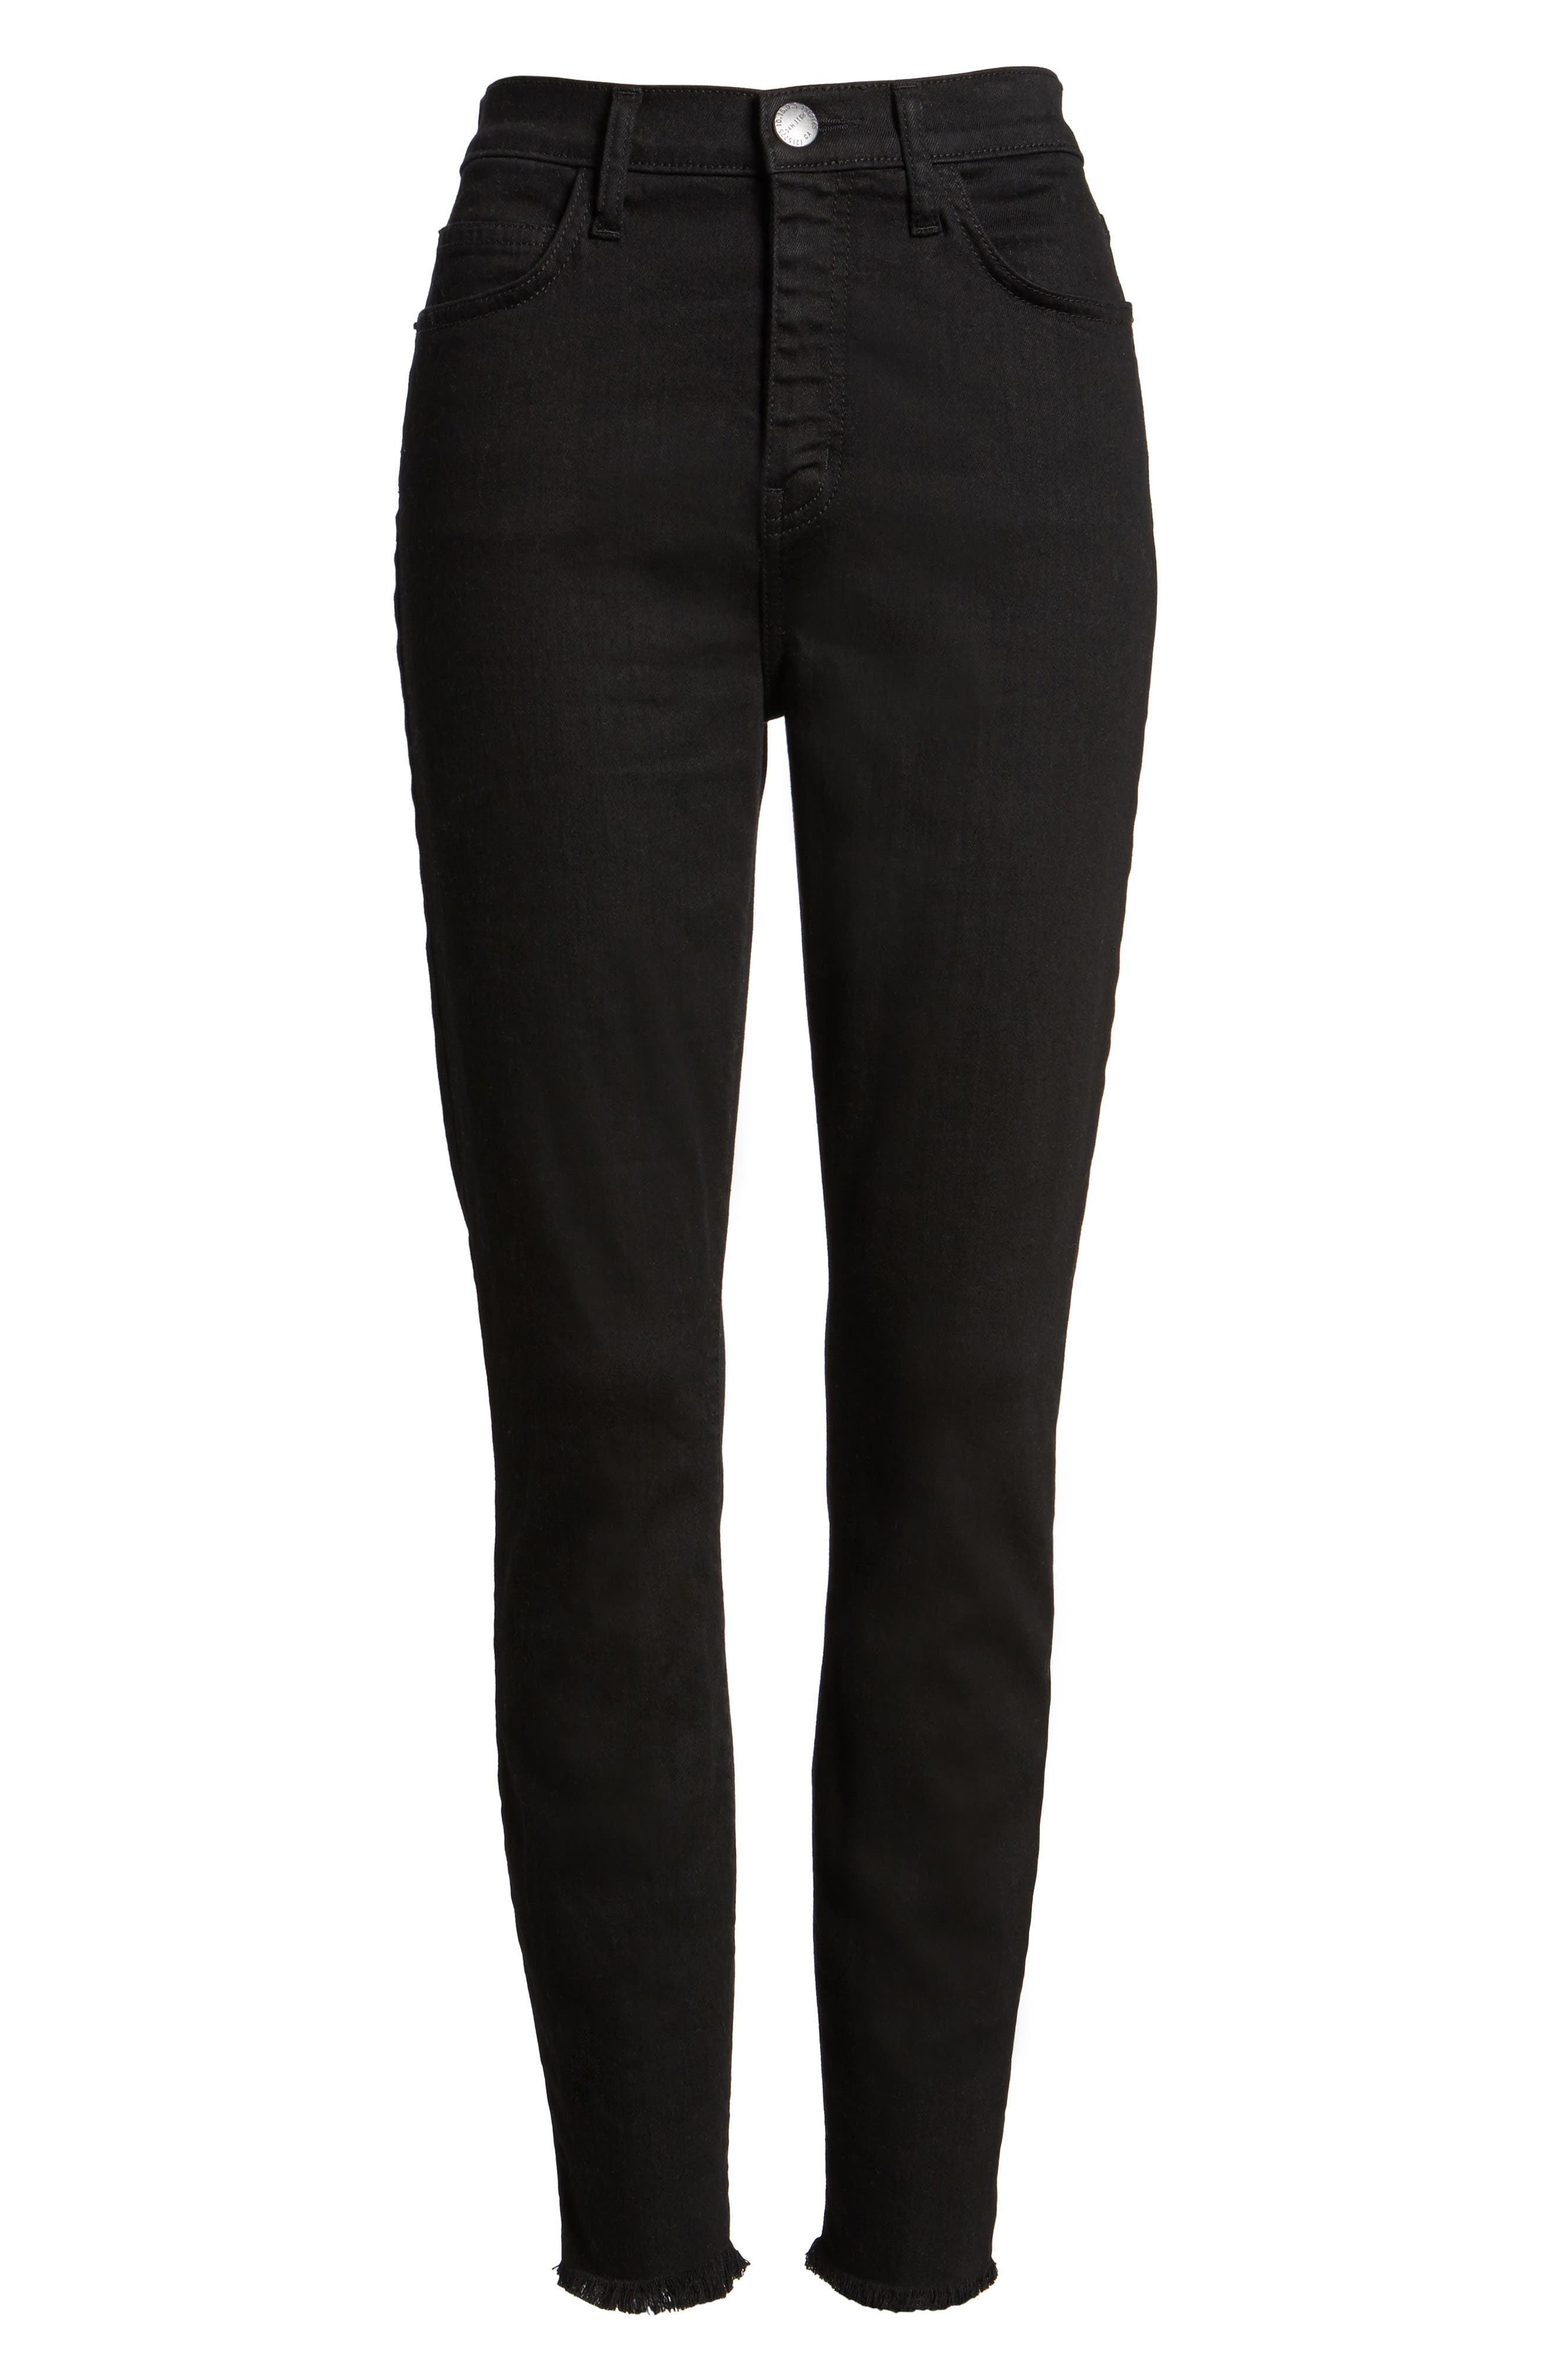 The Super High Waist Stiletto Ankle Skinny Jeans,                             Alternate thumbnail 6, color,                             005